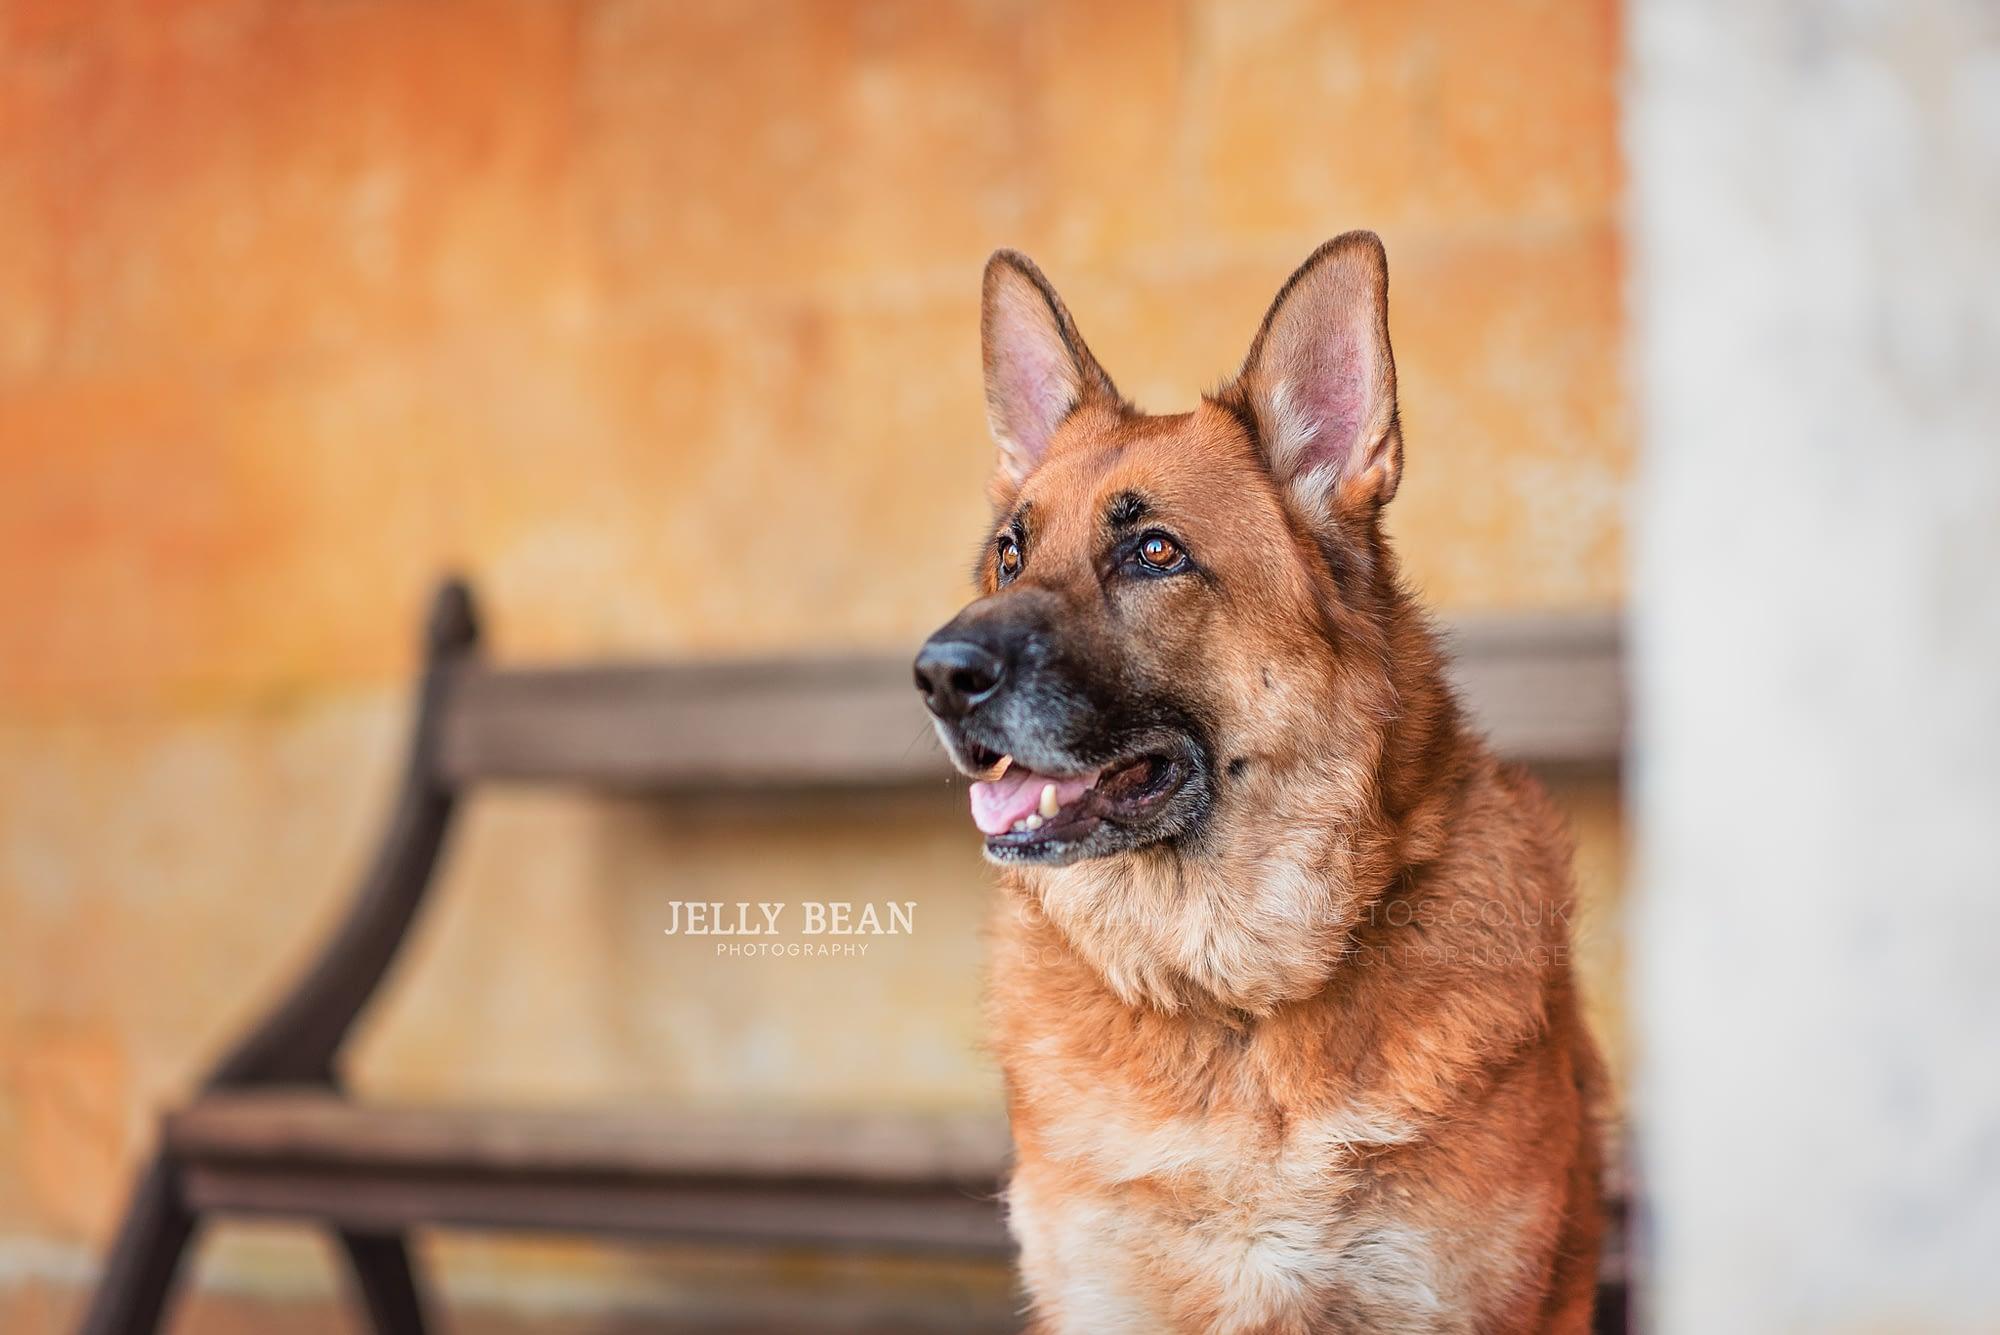 German shepherd dog portrait photography